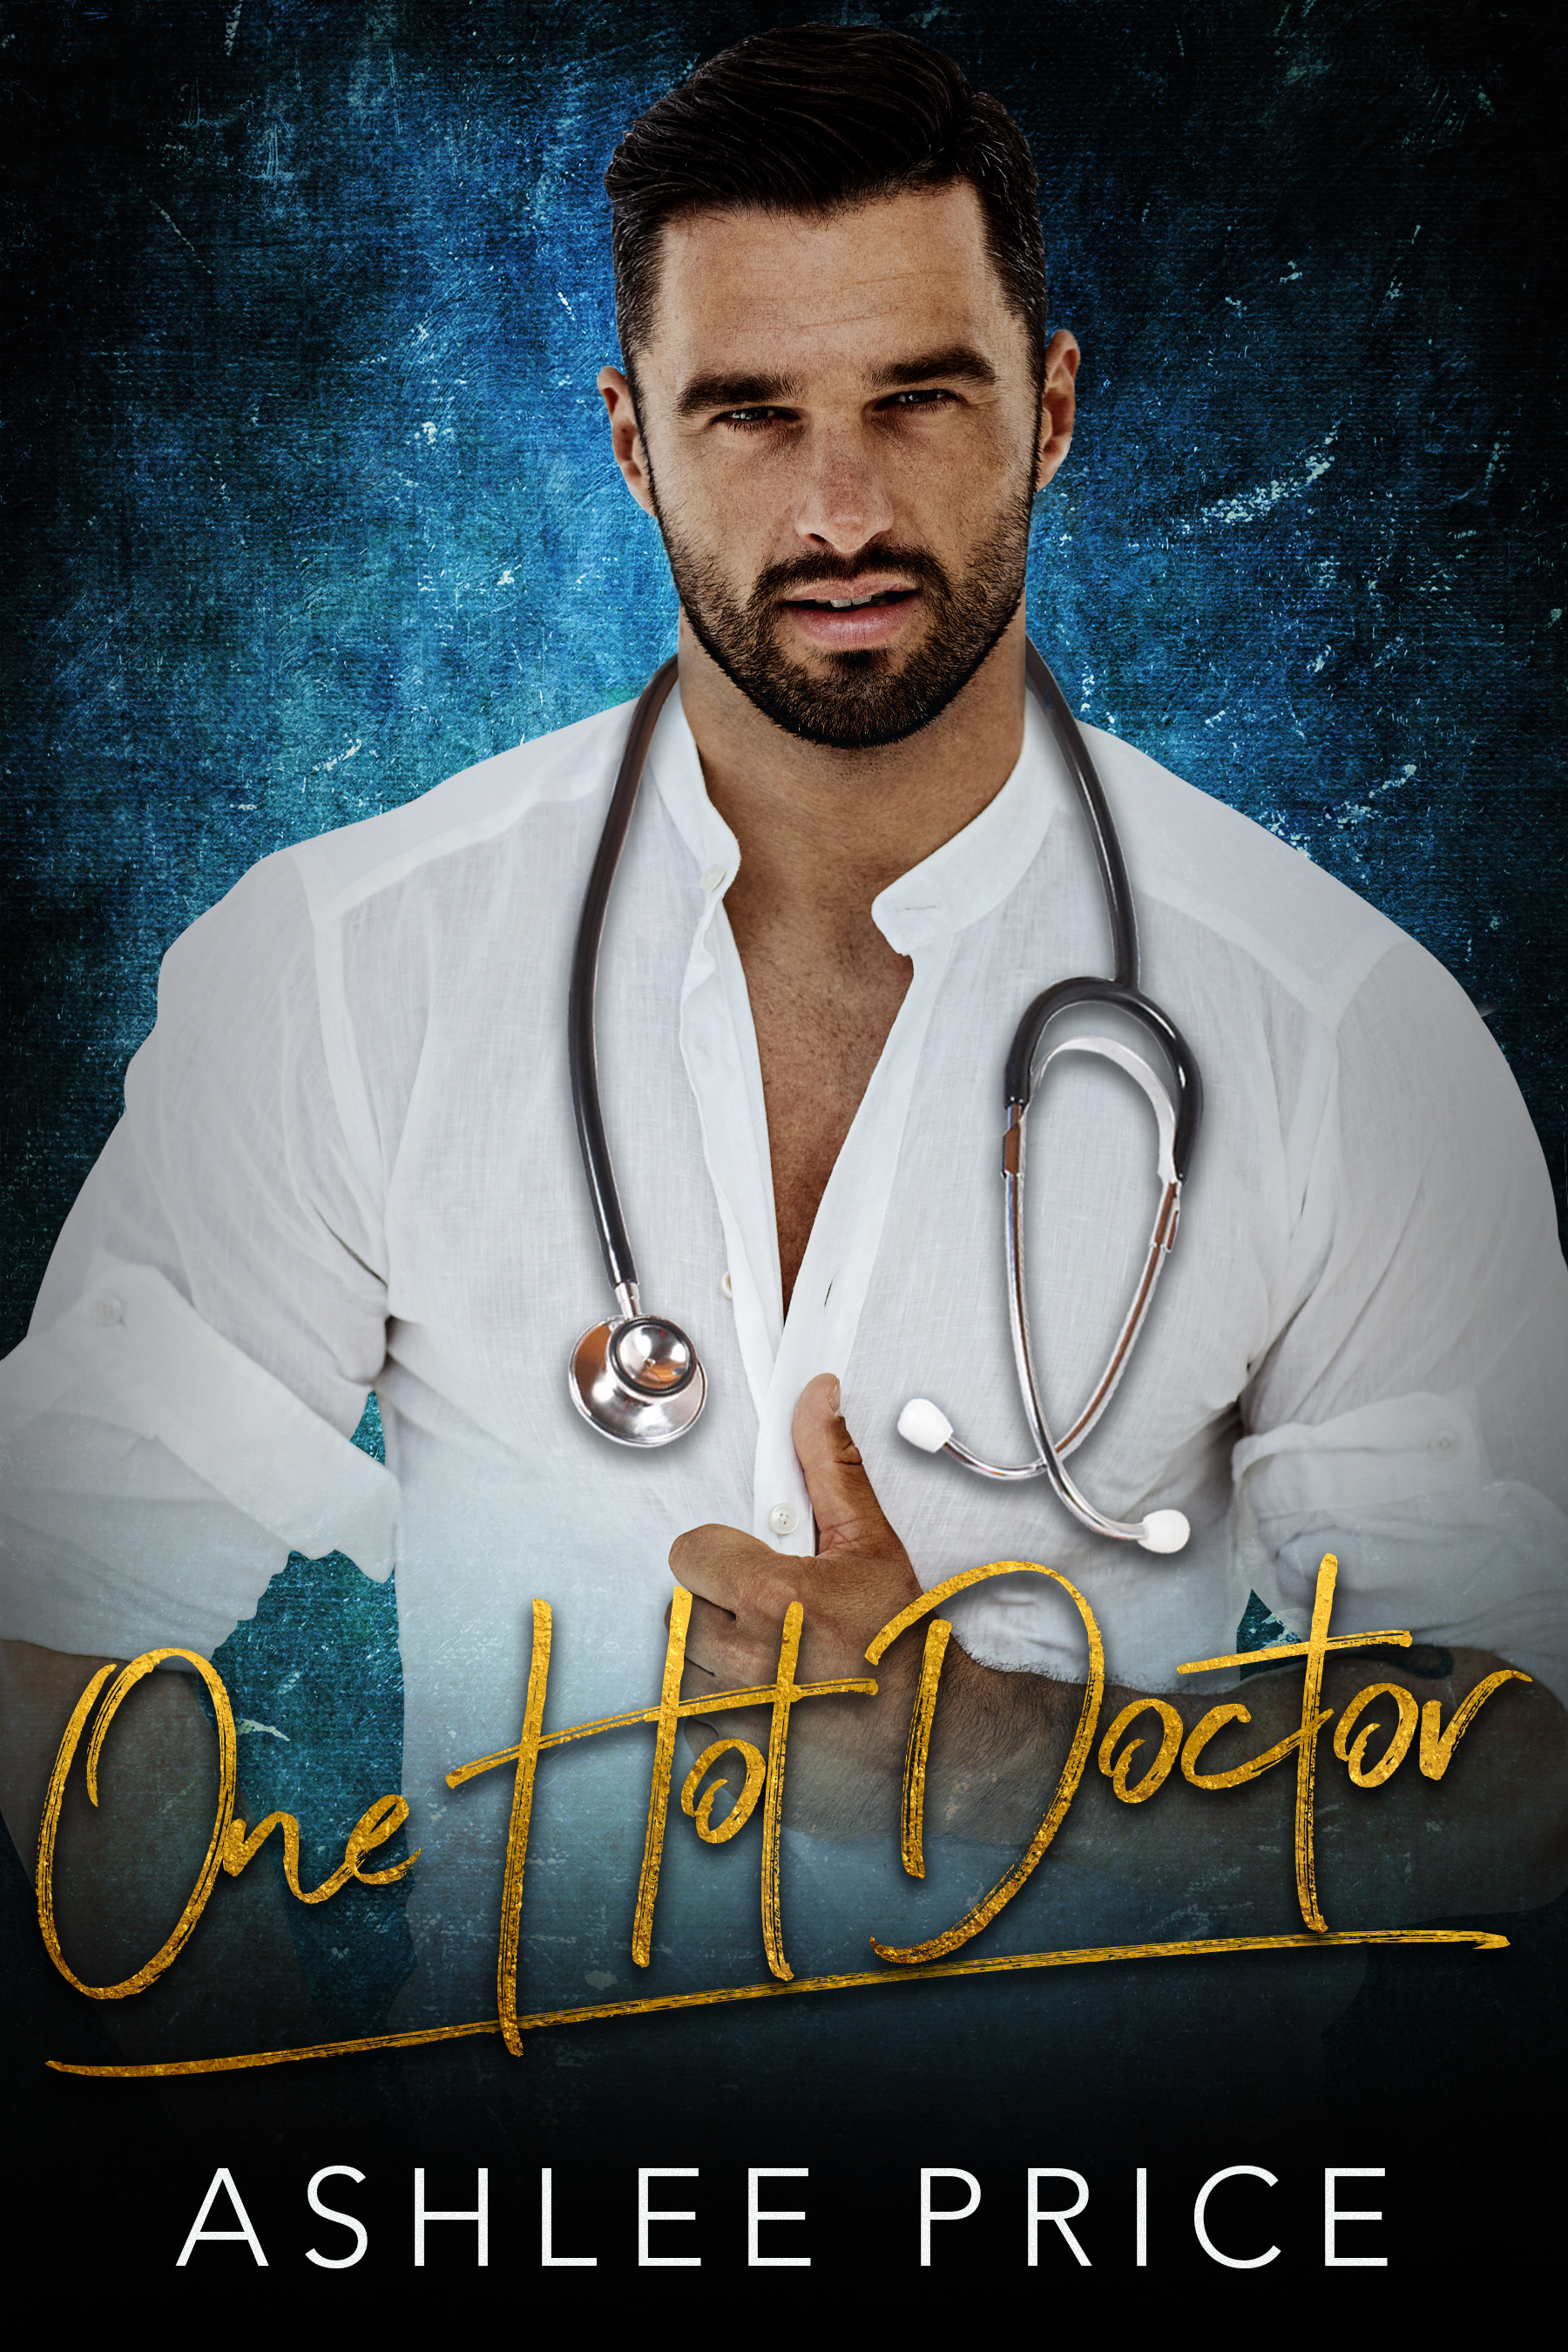 One Hot Doctor ebook.jpg